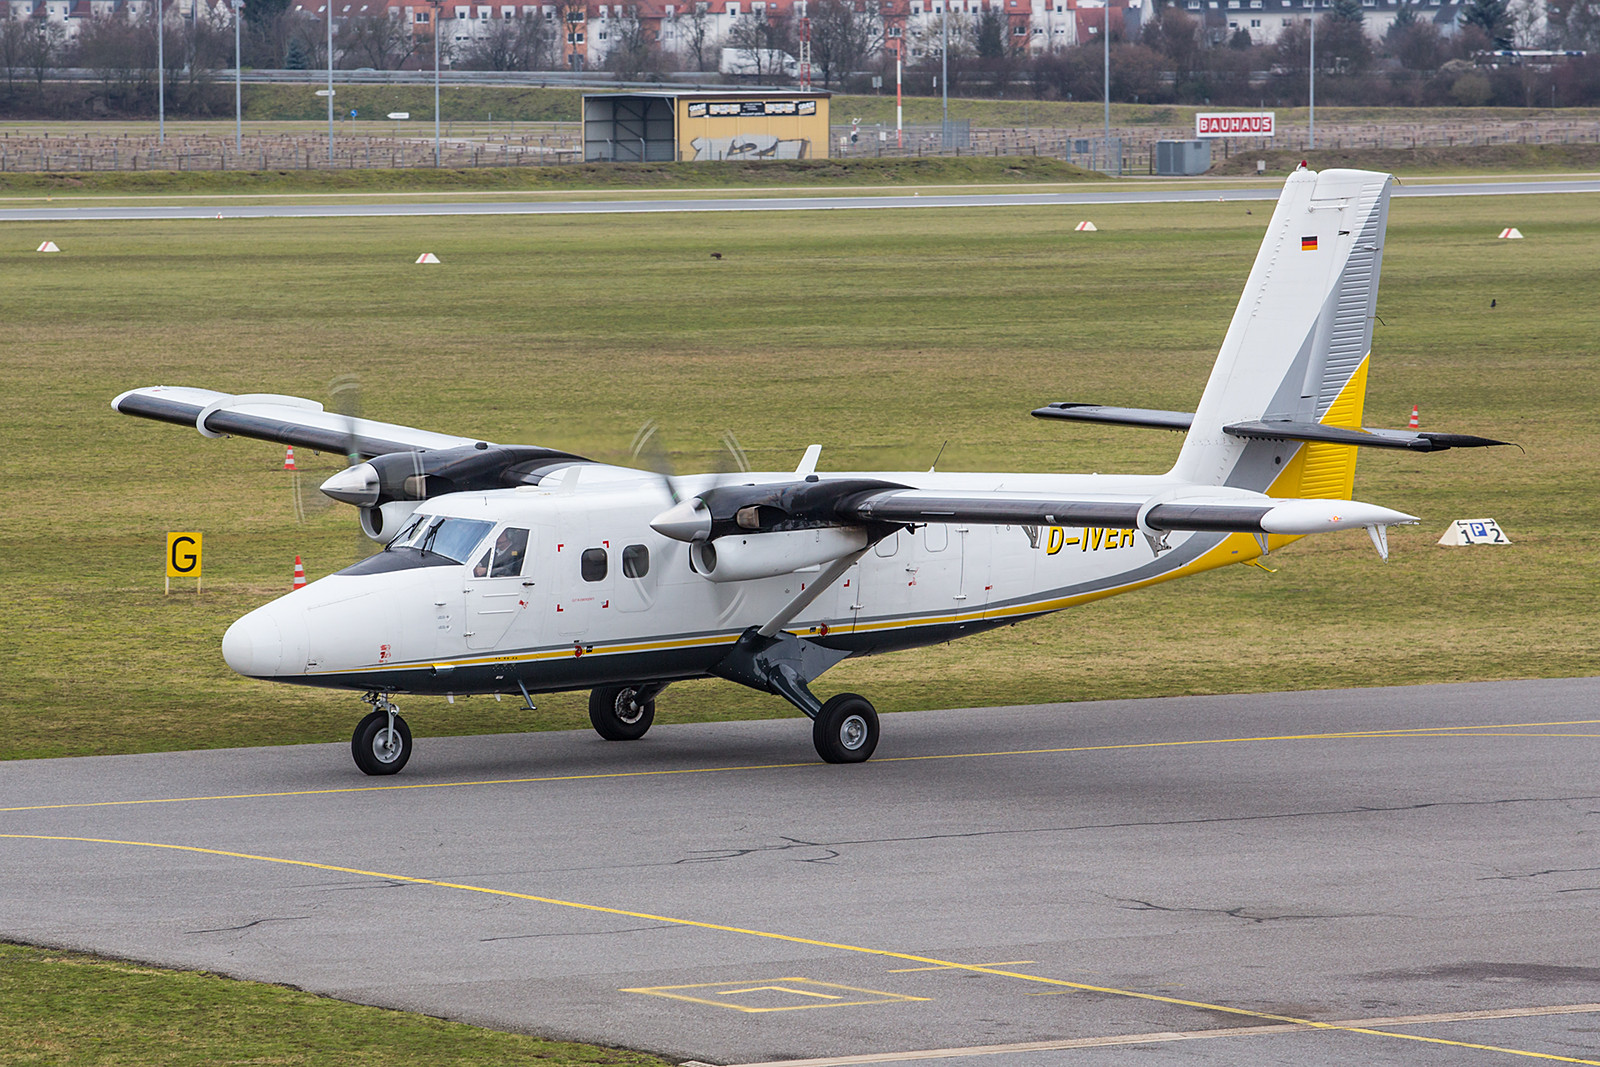 EDFM 17.02.2016; D-IVER De Havilland Canada DHC 6-300 Twin Otter Businesswings